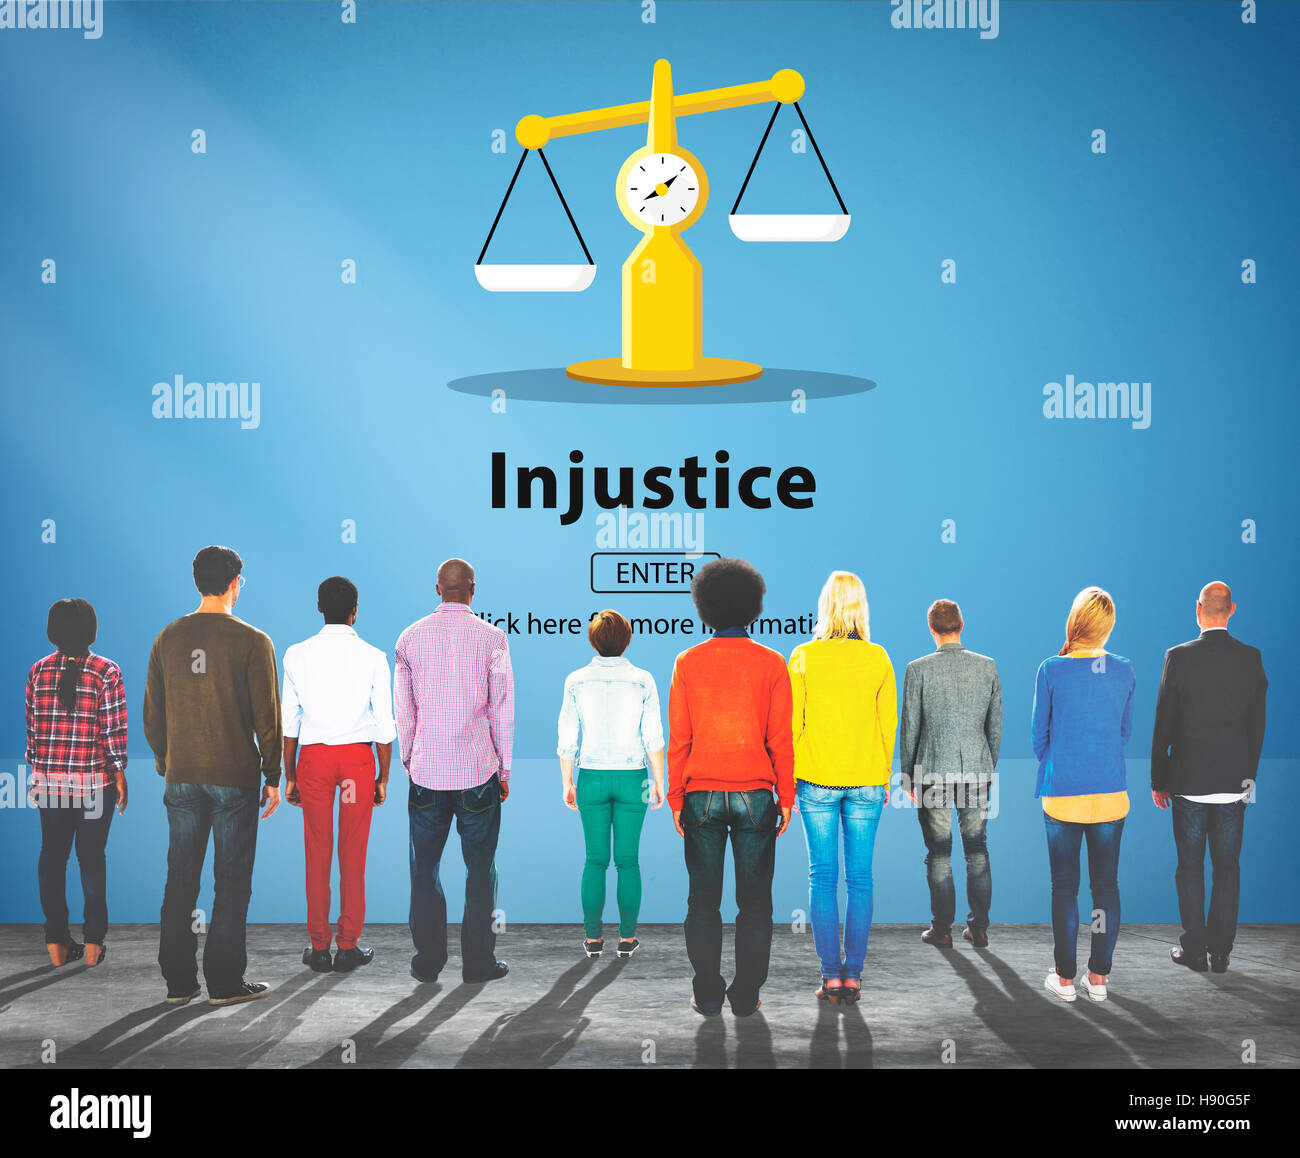 Injustice Inequity Conflict Rebellion Antagonism Concept - Stock Image